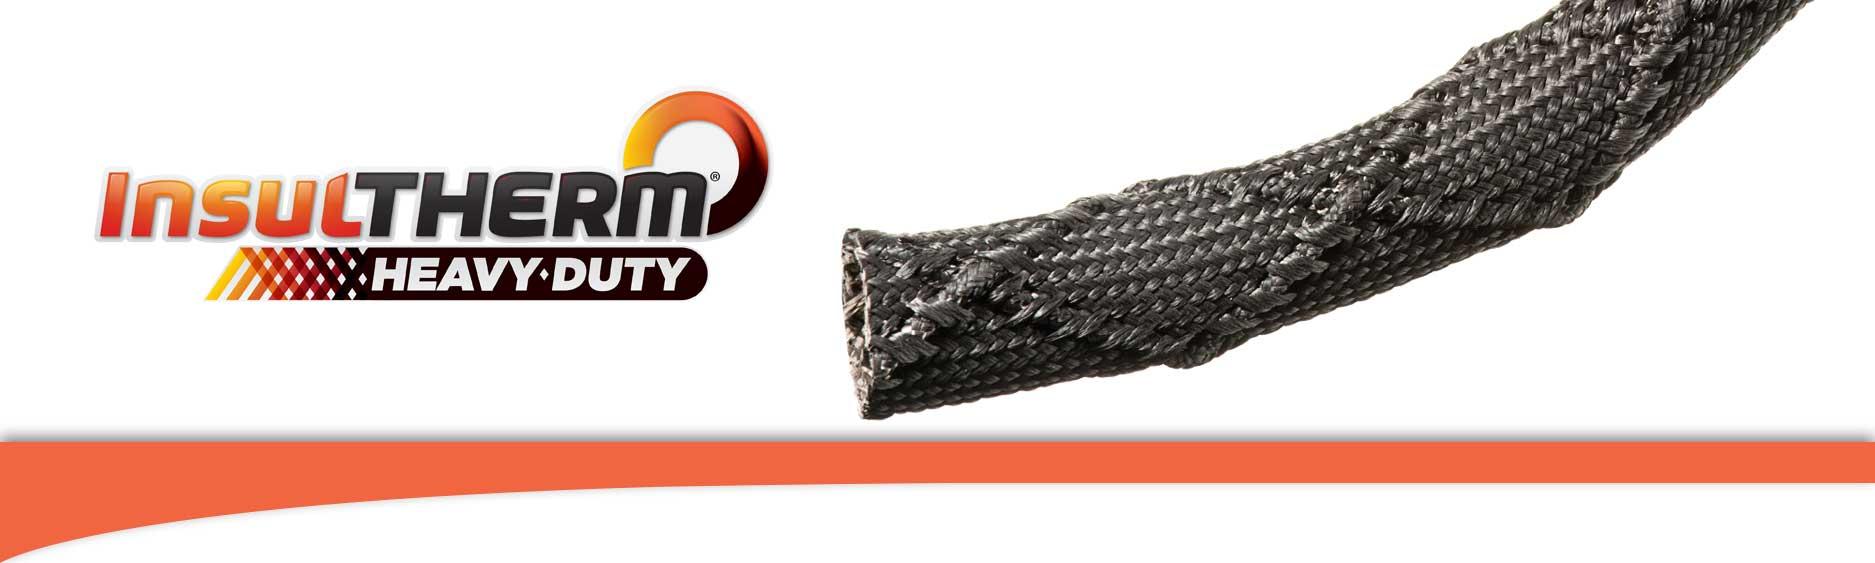 Heavy Duty Fiberglass : Techflex insultherm heavy duty fiberglass